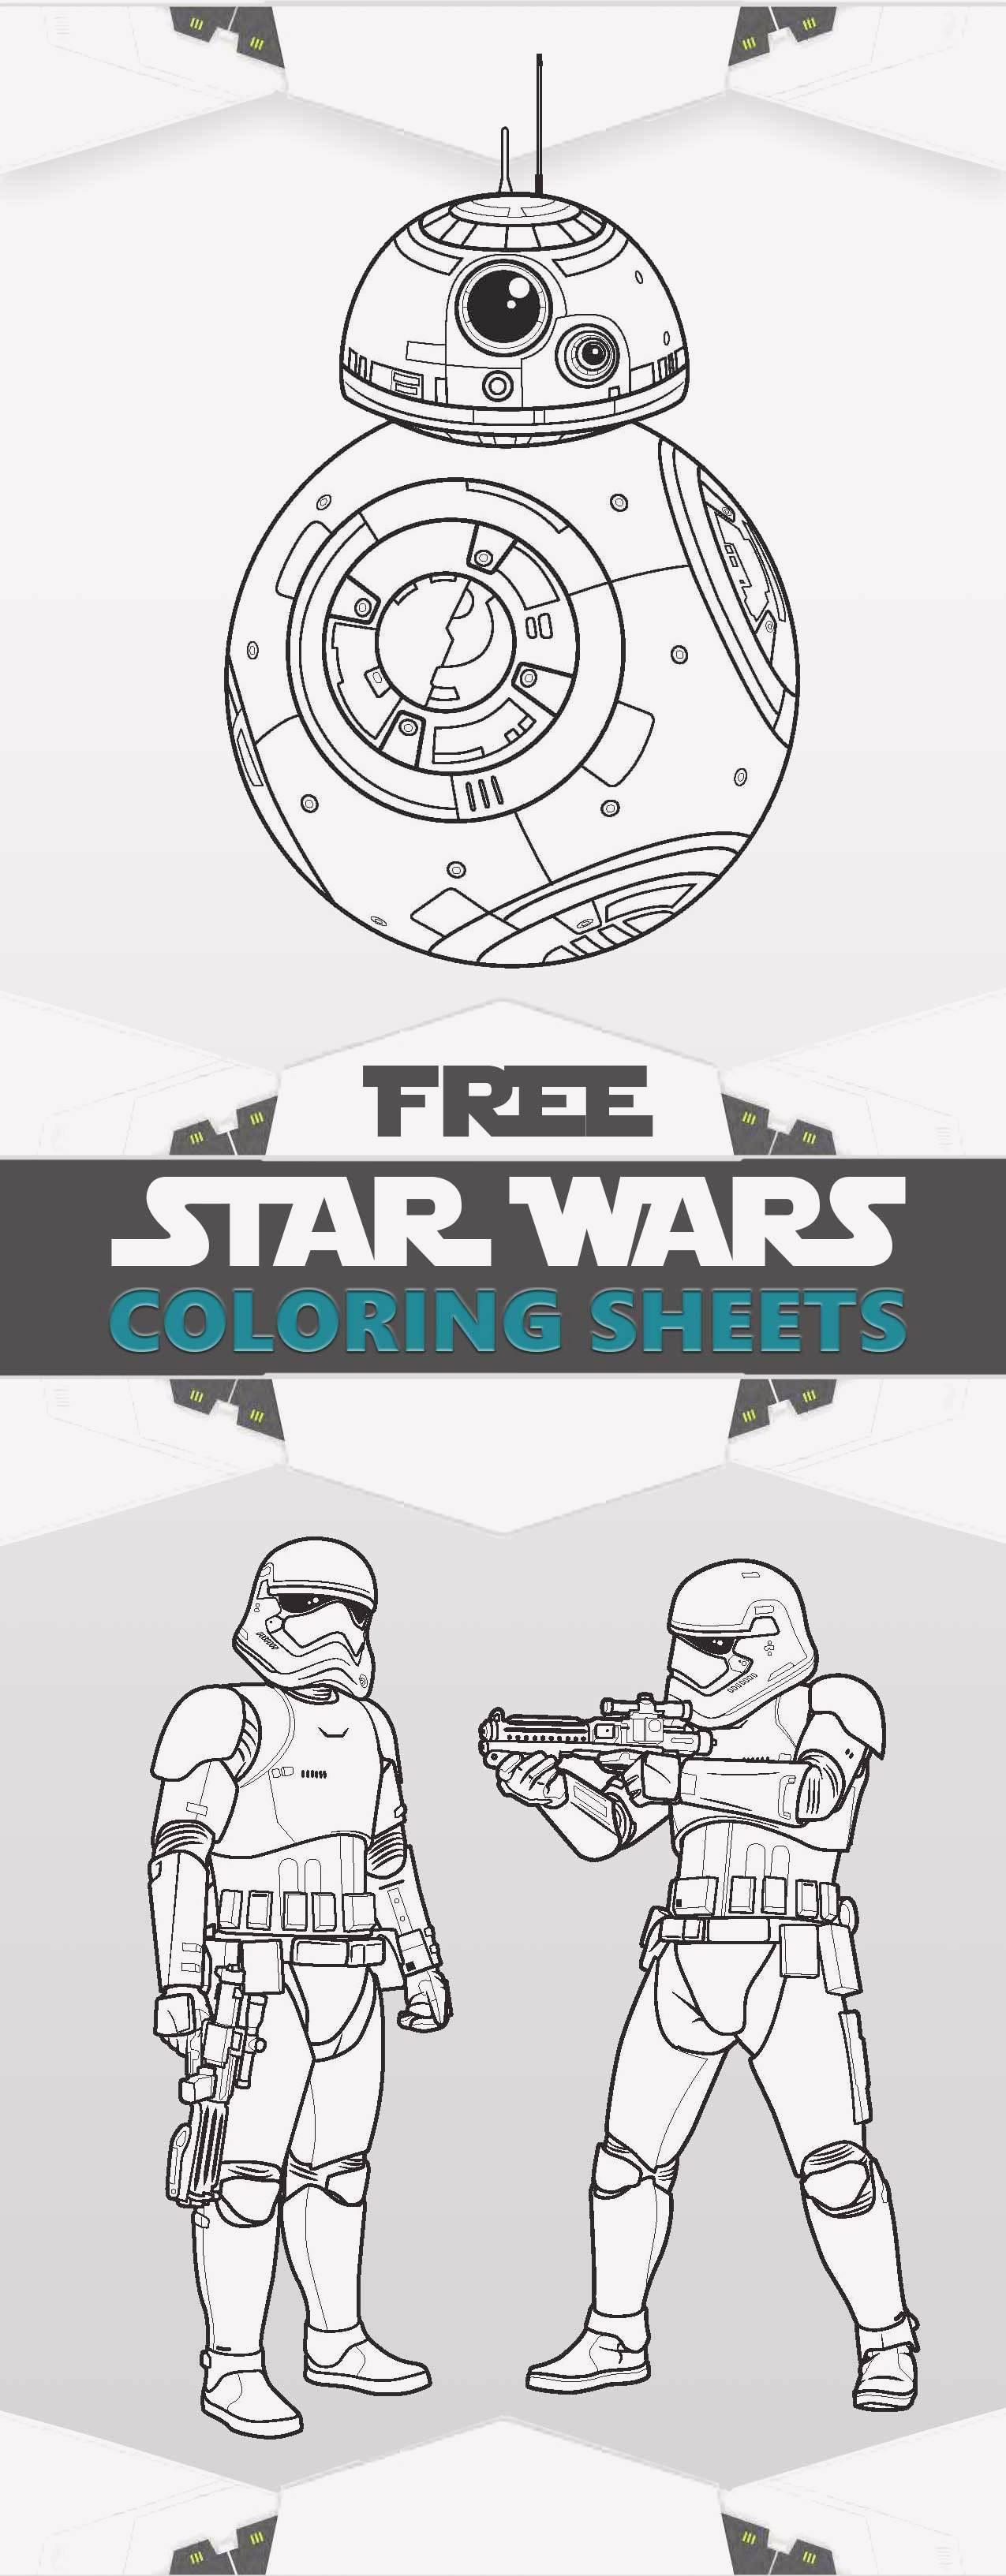 Star Wars Ausmalbilder General Grievous Einzigartig General Grievous Ausmalbilder Einzigartig Sitemap Play & Learn Fotos